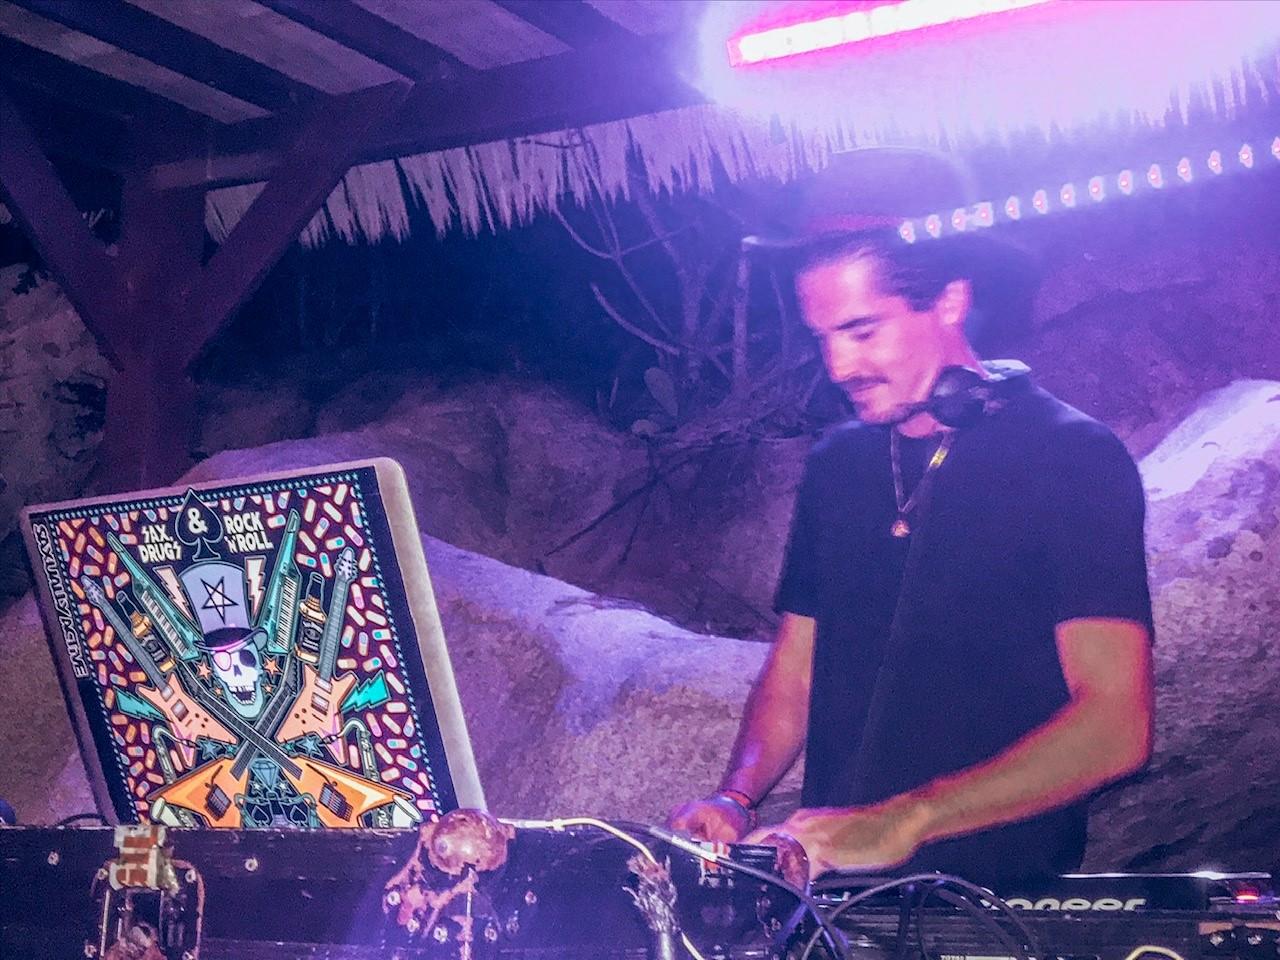 CocoMaya - Virgin Gorda, British Virgin Islands. Resident DJ James Park